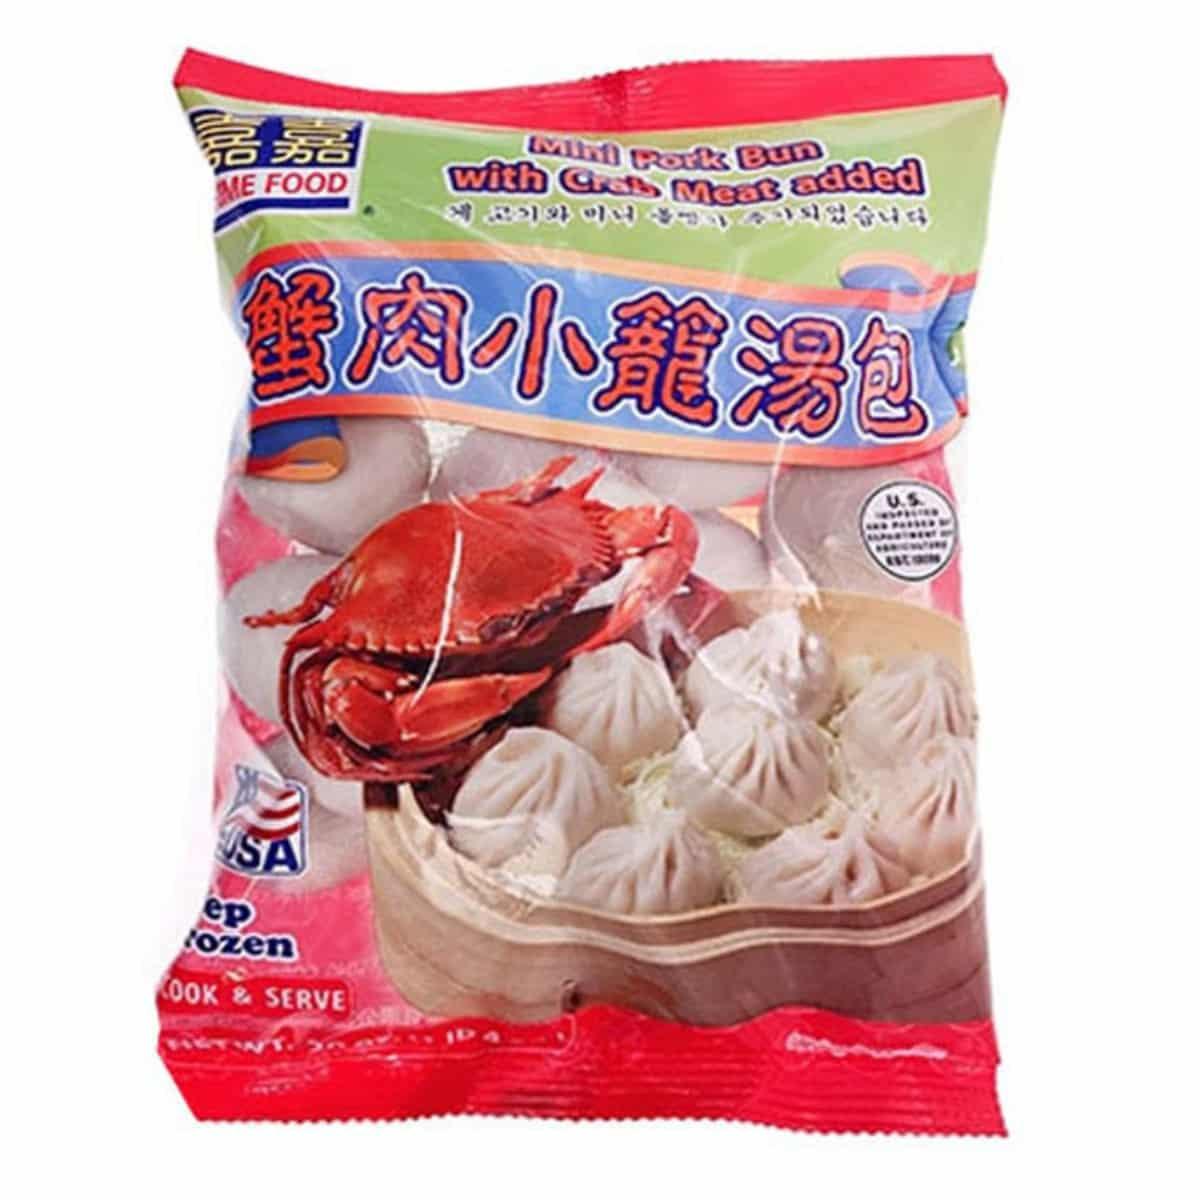 PF Mini Pork Bun with Crab..